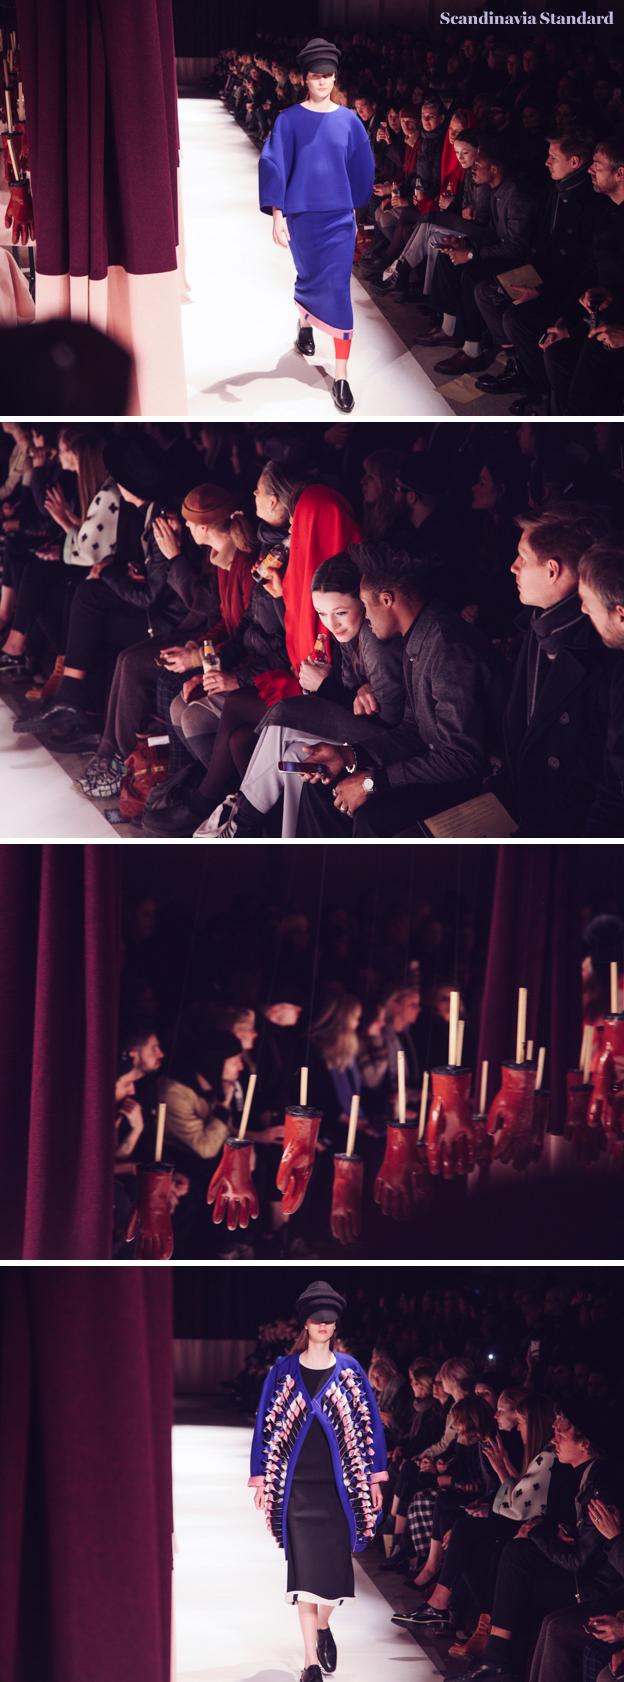 Henrik Vibskov Audience, Gloves and Blues at AW15 - Copenhagen Fashion Week   Scandinavia Standard